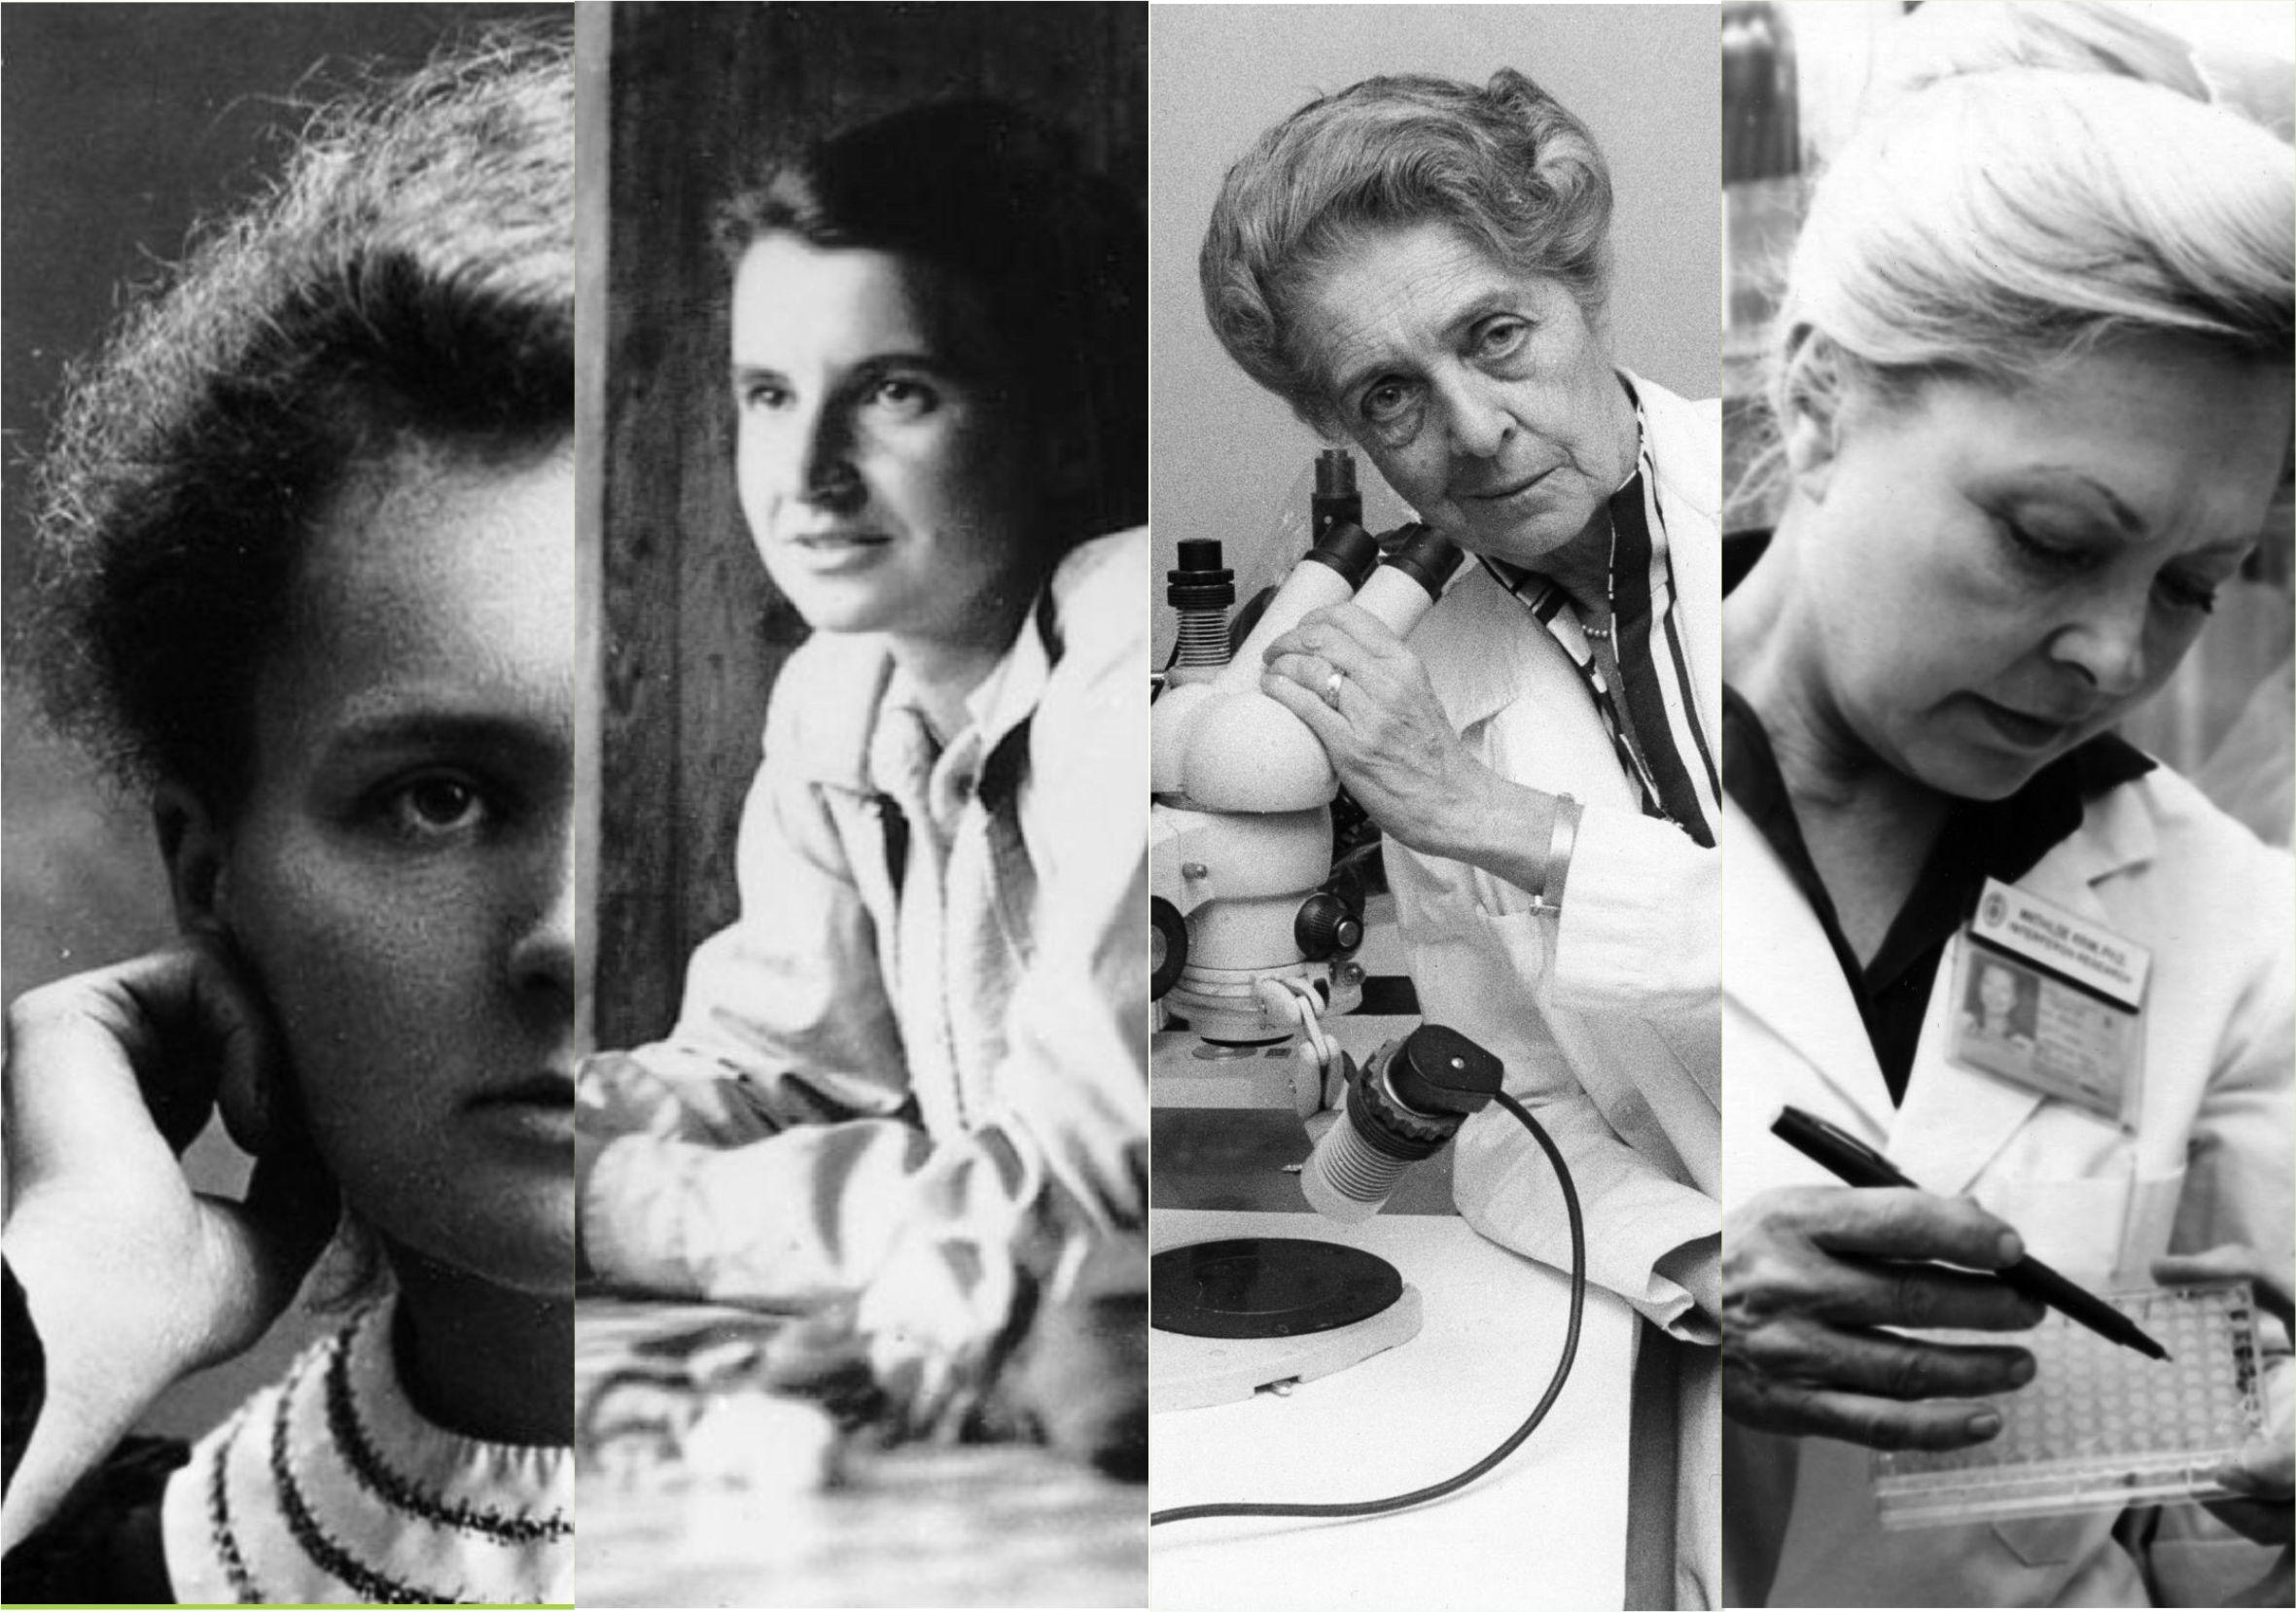 Grandes-mulheres-cientistas-dia-internacional-mulher-física-certus-ensino-médio-capa